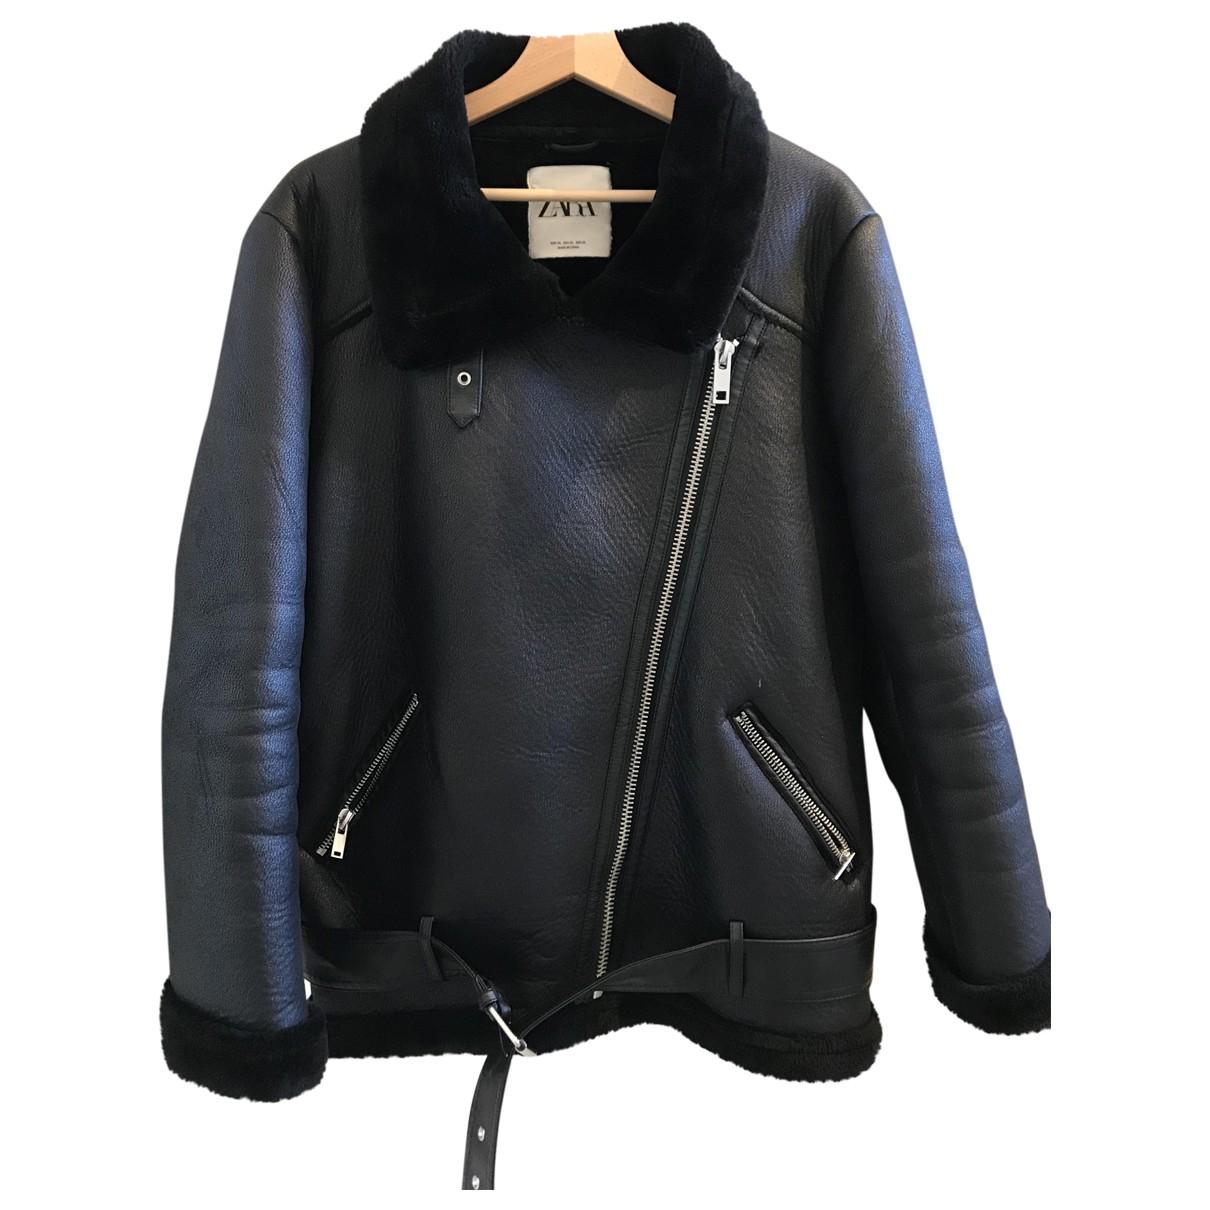 Zara \N Black jacket for Women XL International